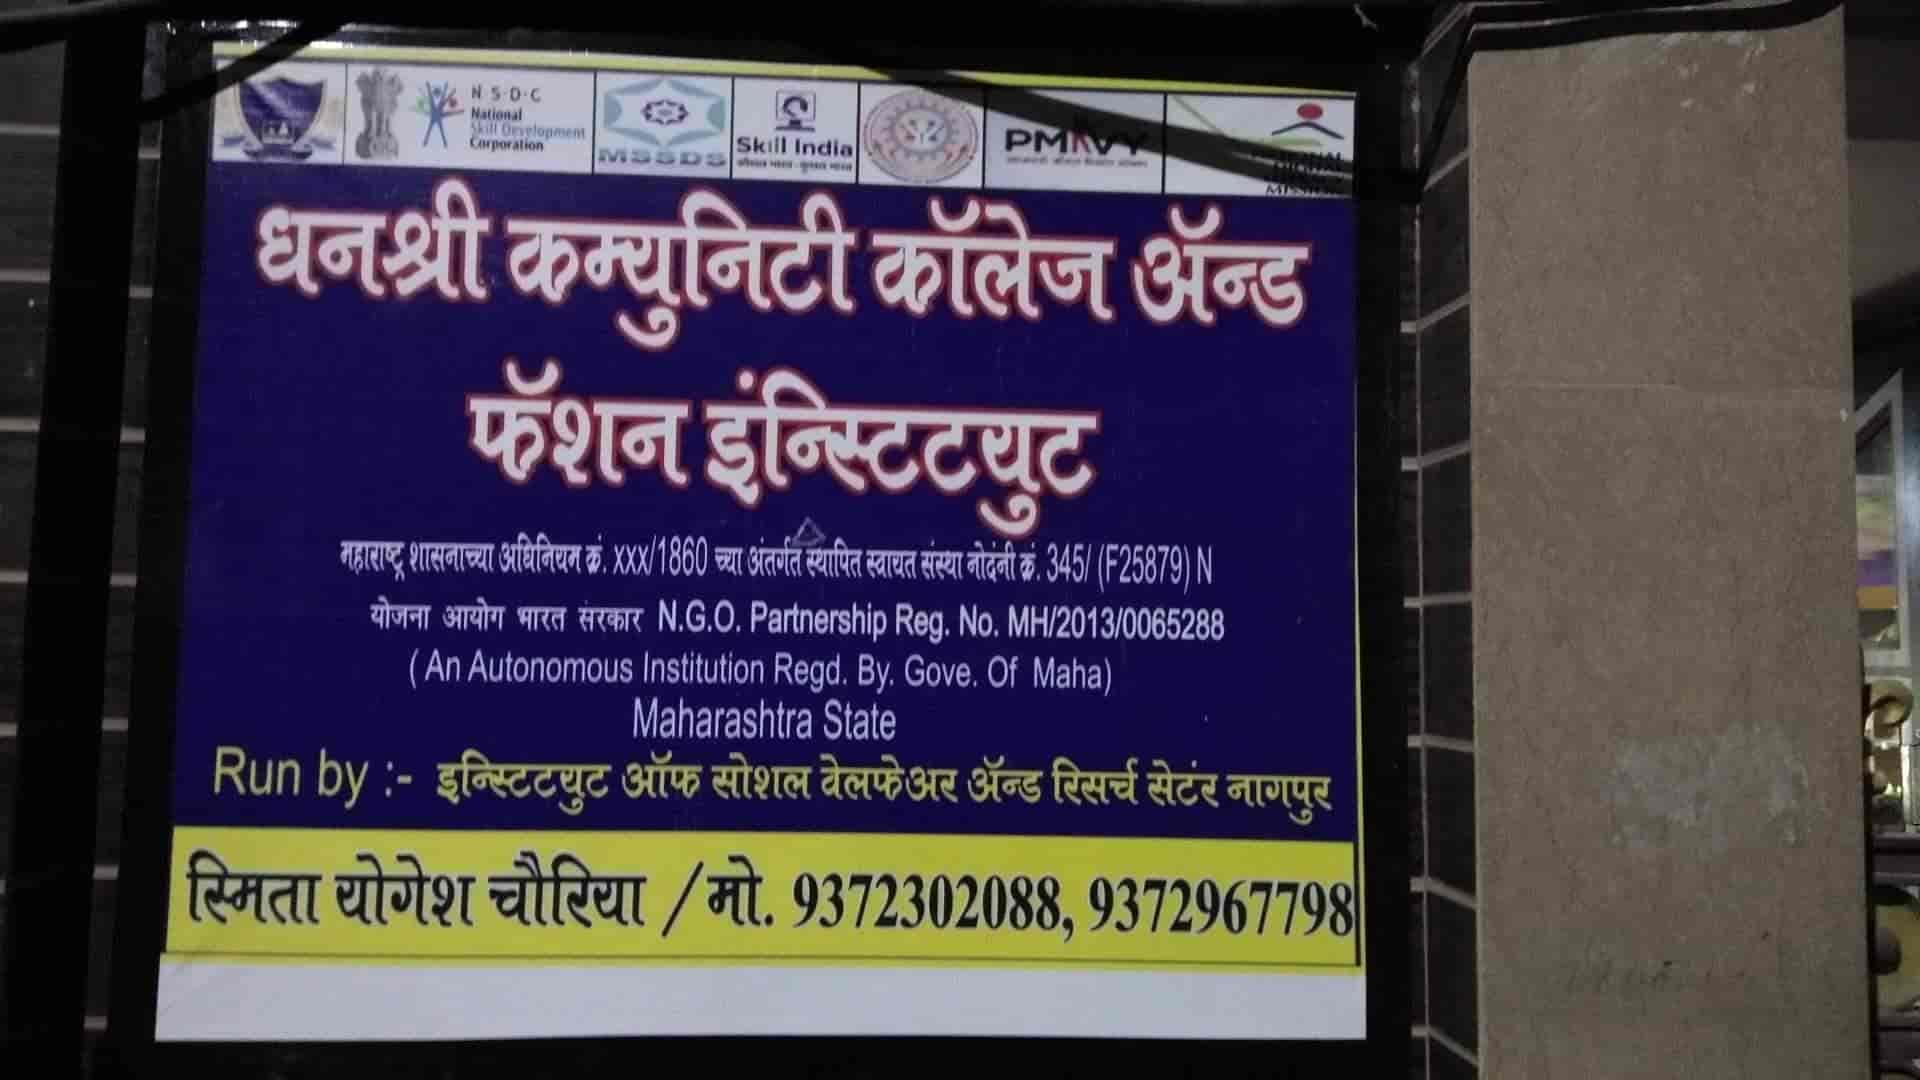 Dhanashree Fashion Designing Institute And Training Center Pardi Tailors In Nagpur Justdial